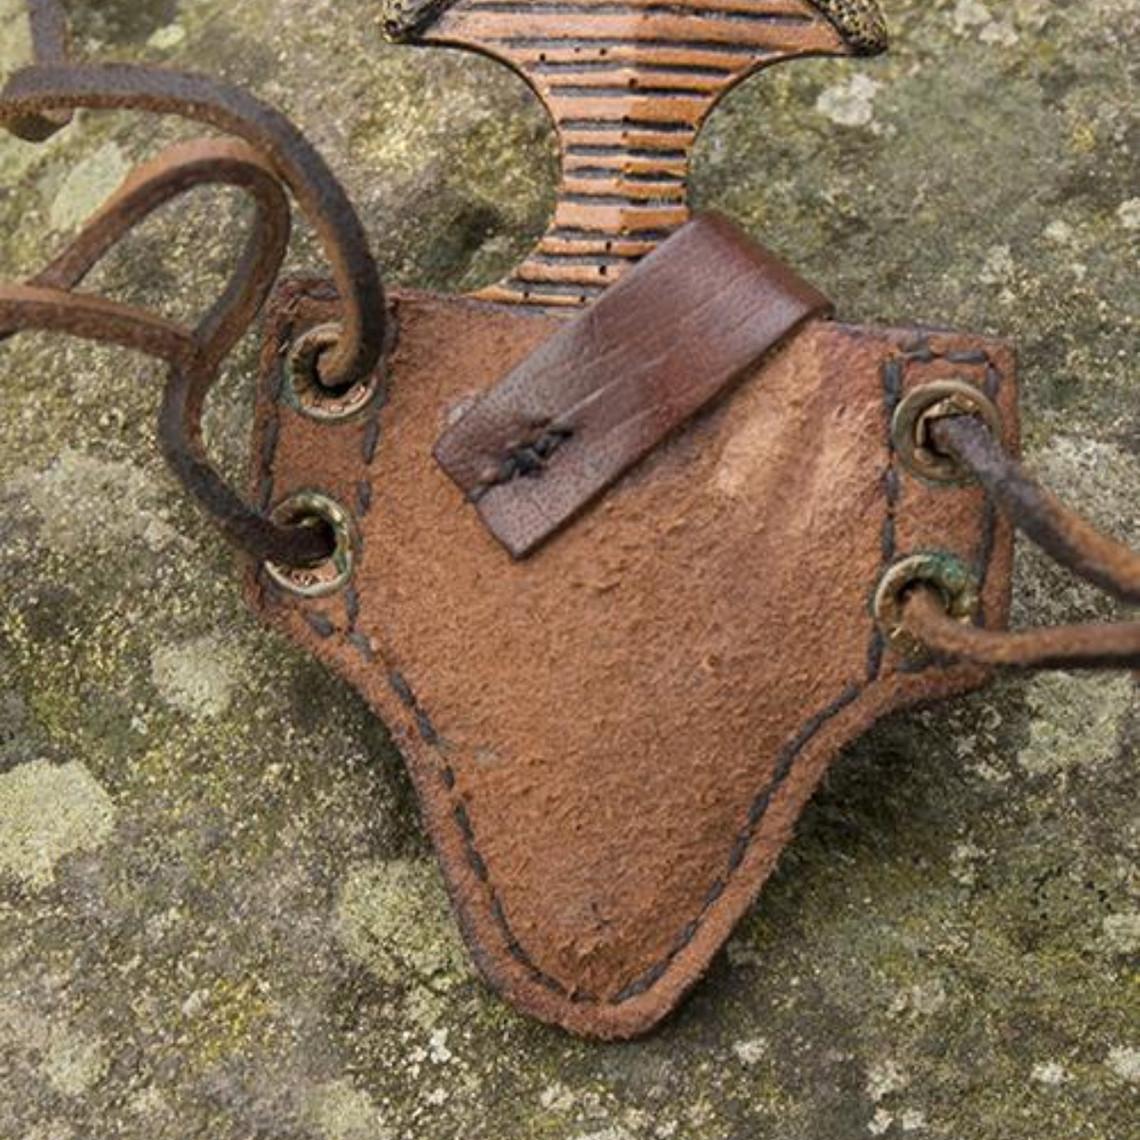 Epic Armoury LARP handled dolk med hållare, brun